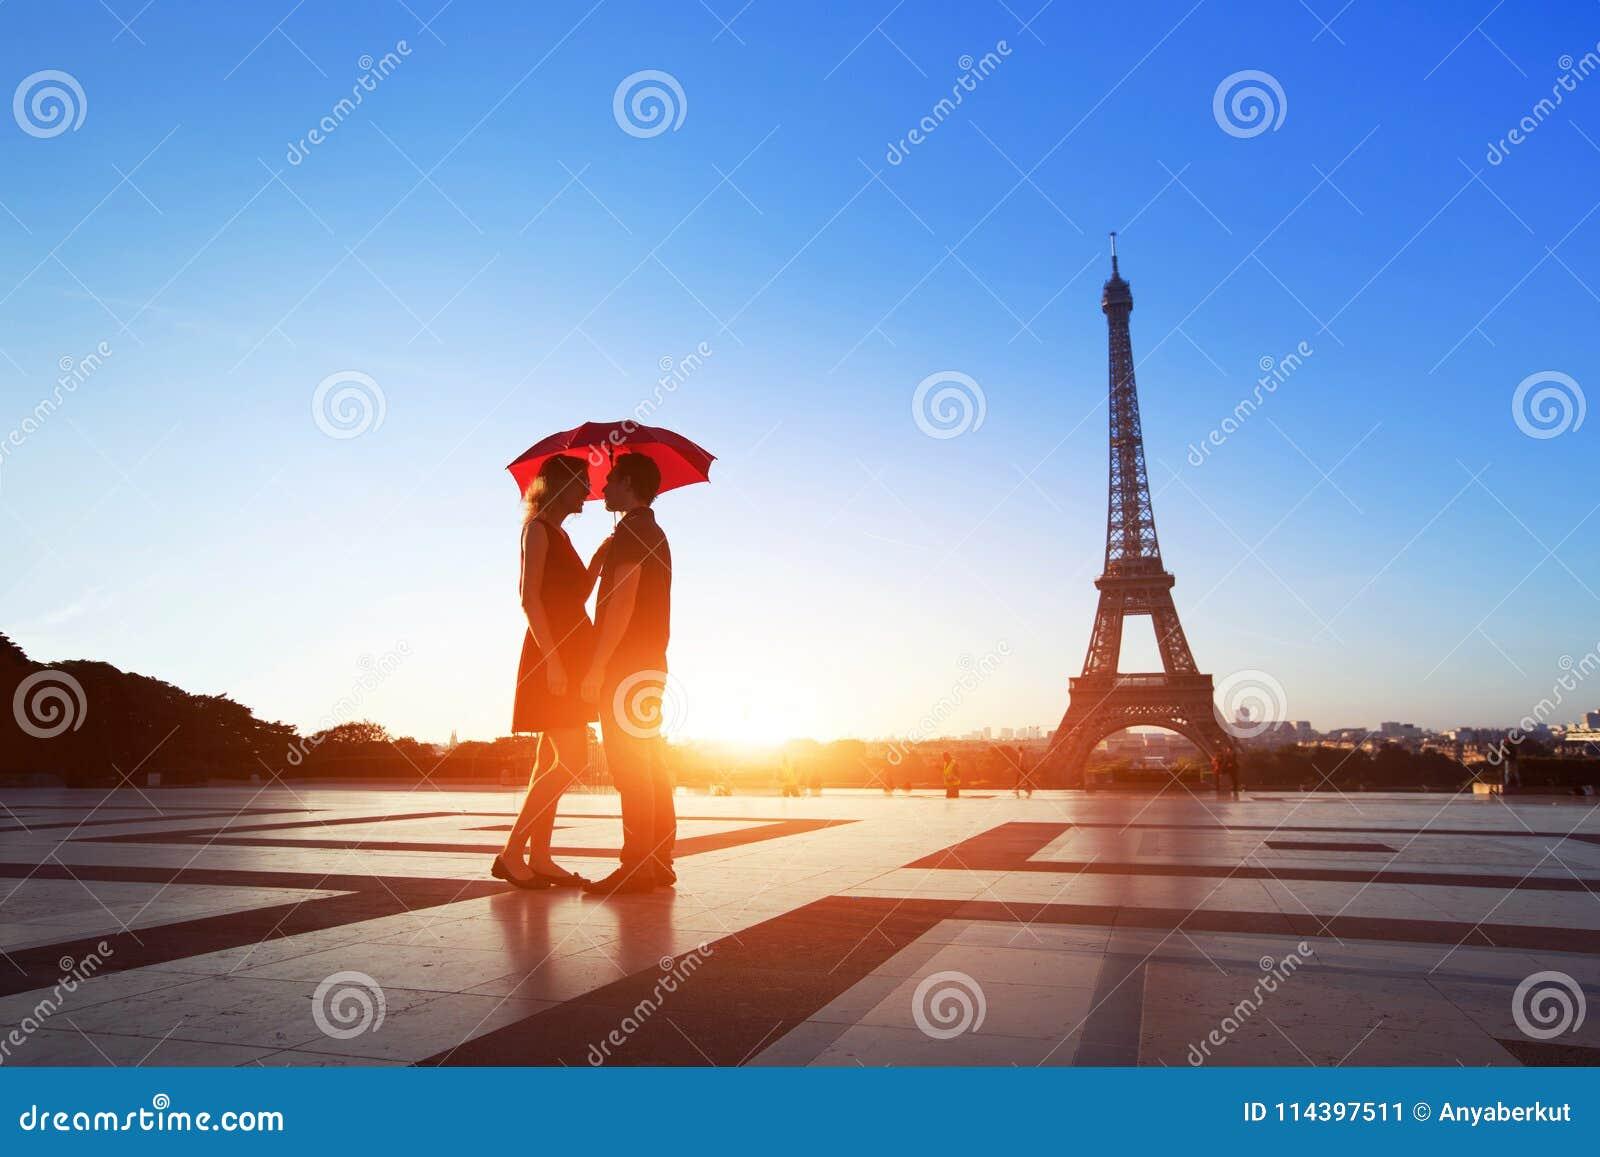 Romantic couple in Paris, man and woman under umbrella near Eiffel Tower